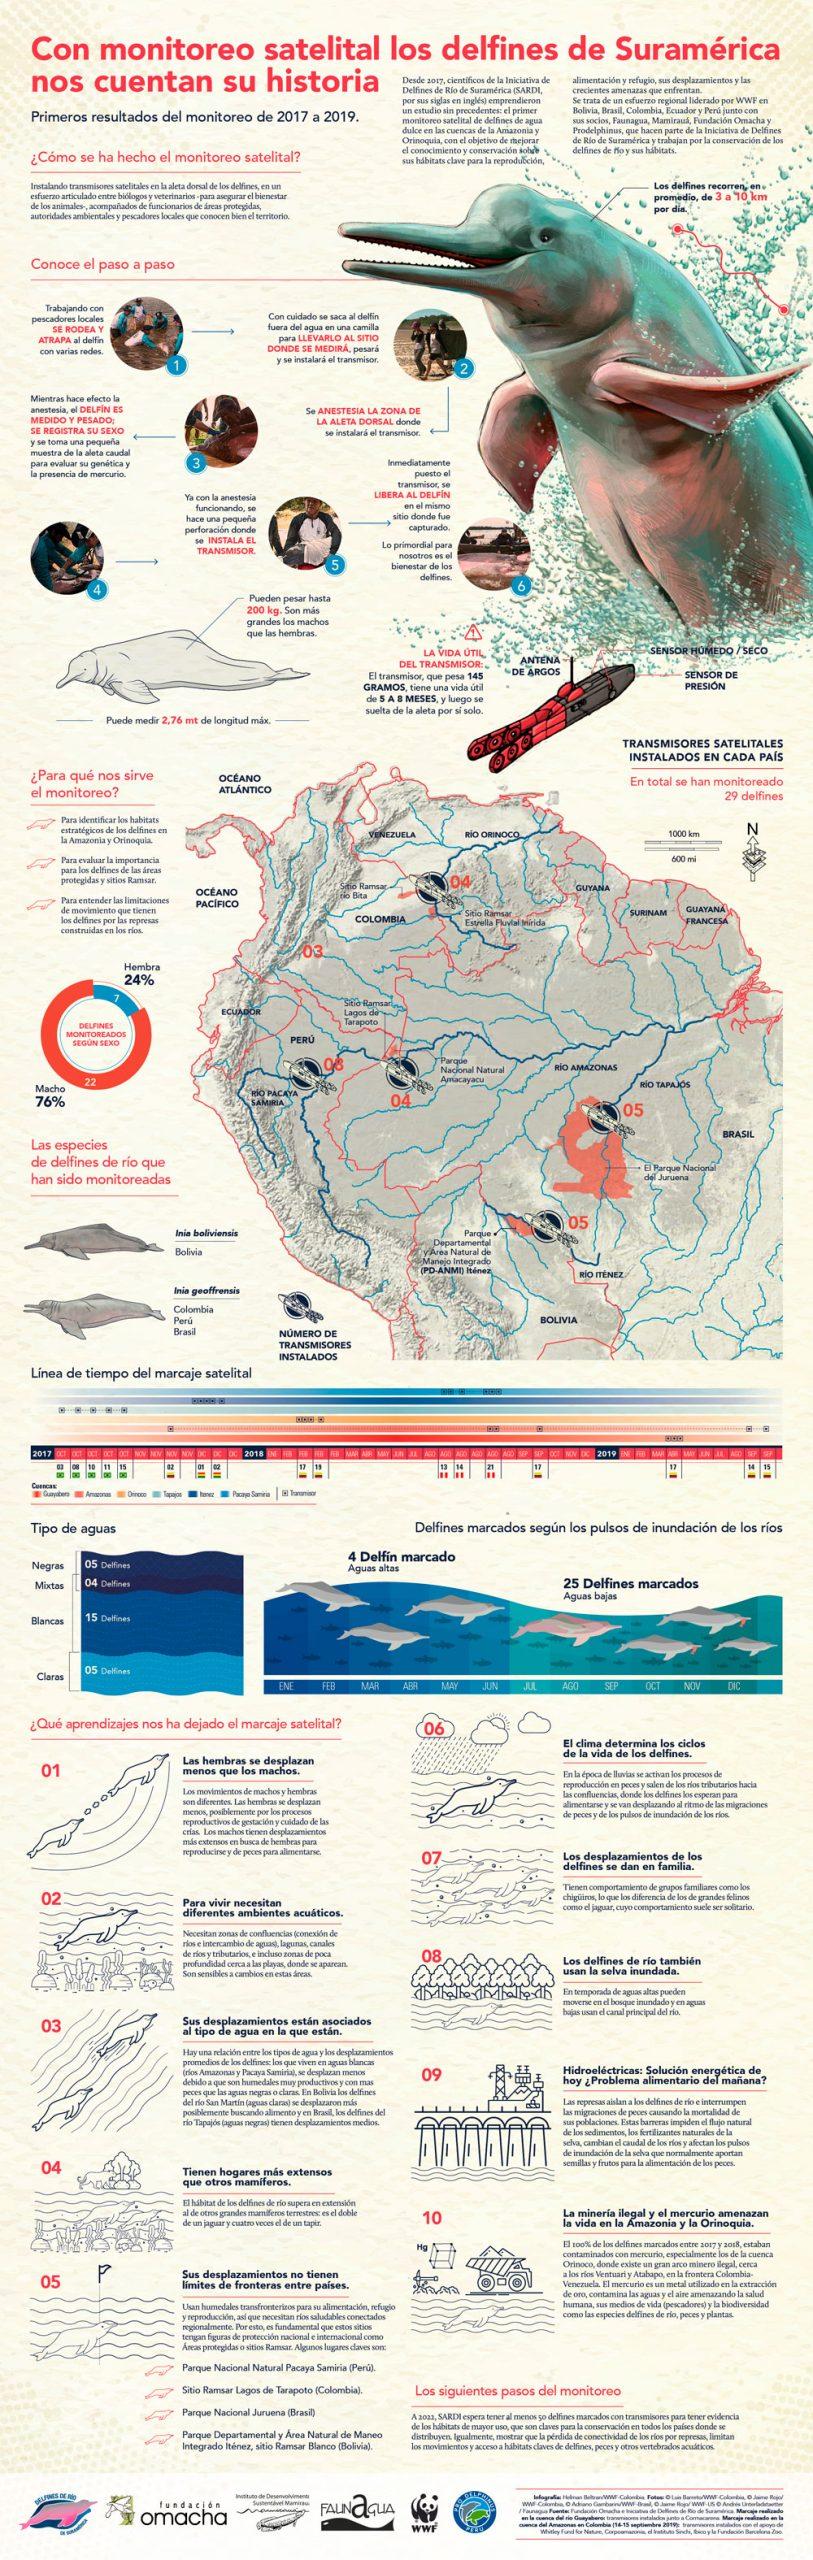 infografia-sobre-monitoreo-de-delfines